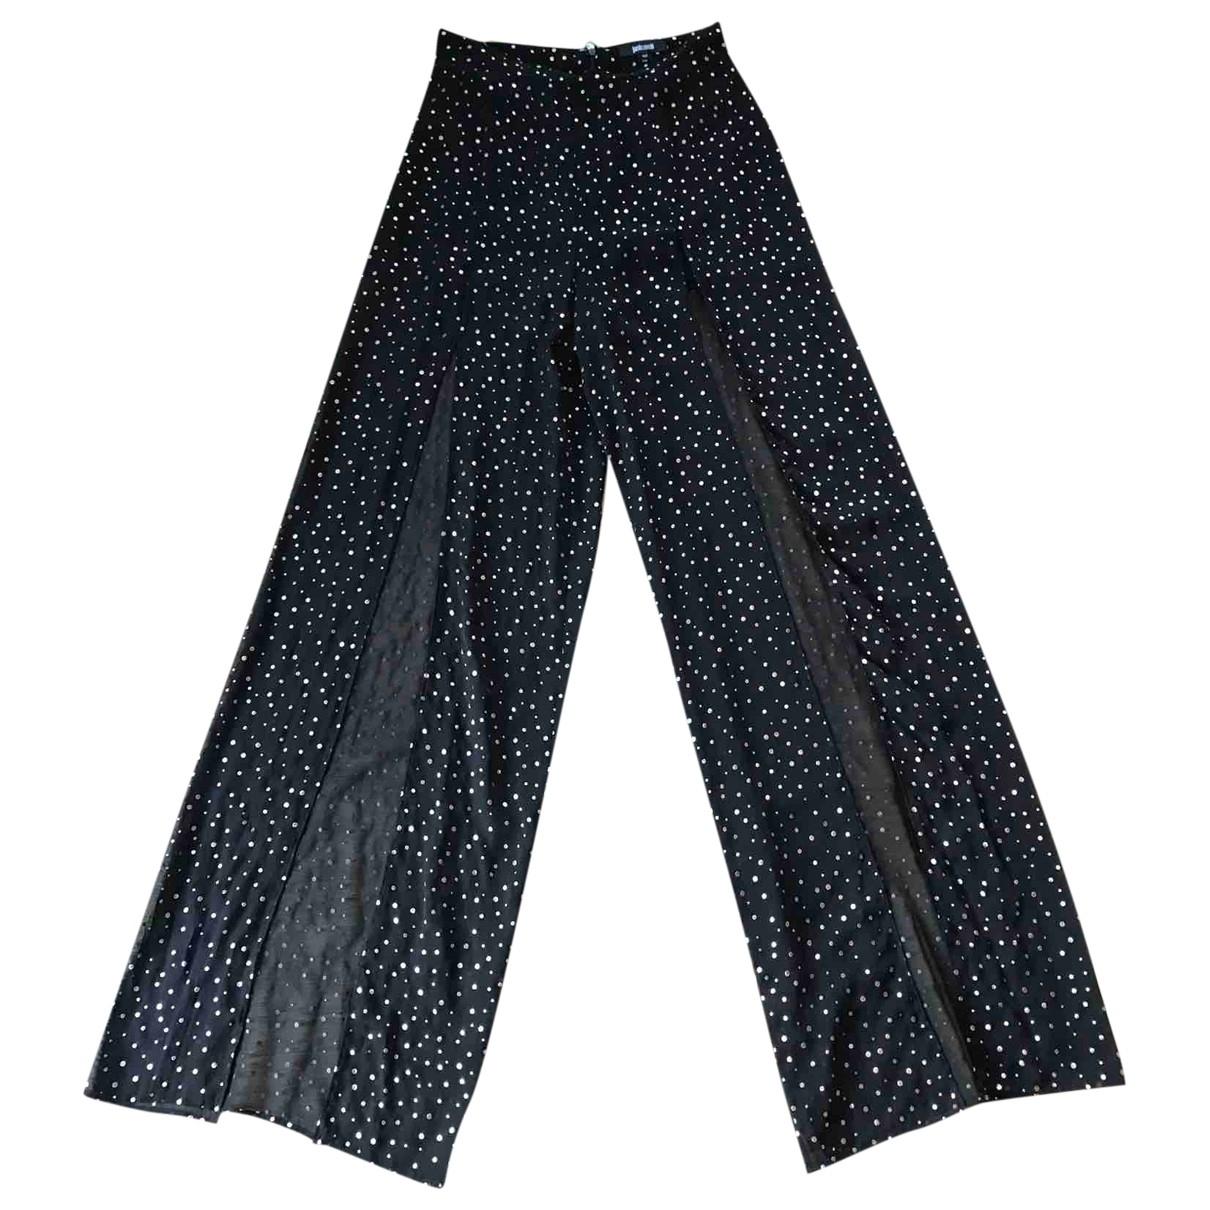 Just Cavalli \N Black Silk Trousers for Women 42 IT